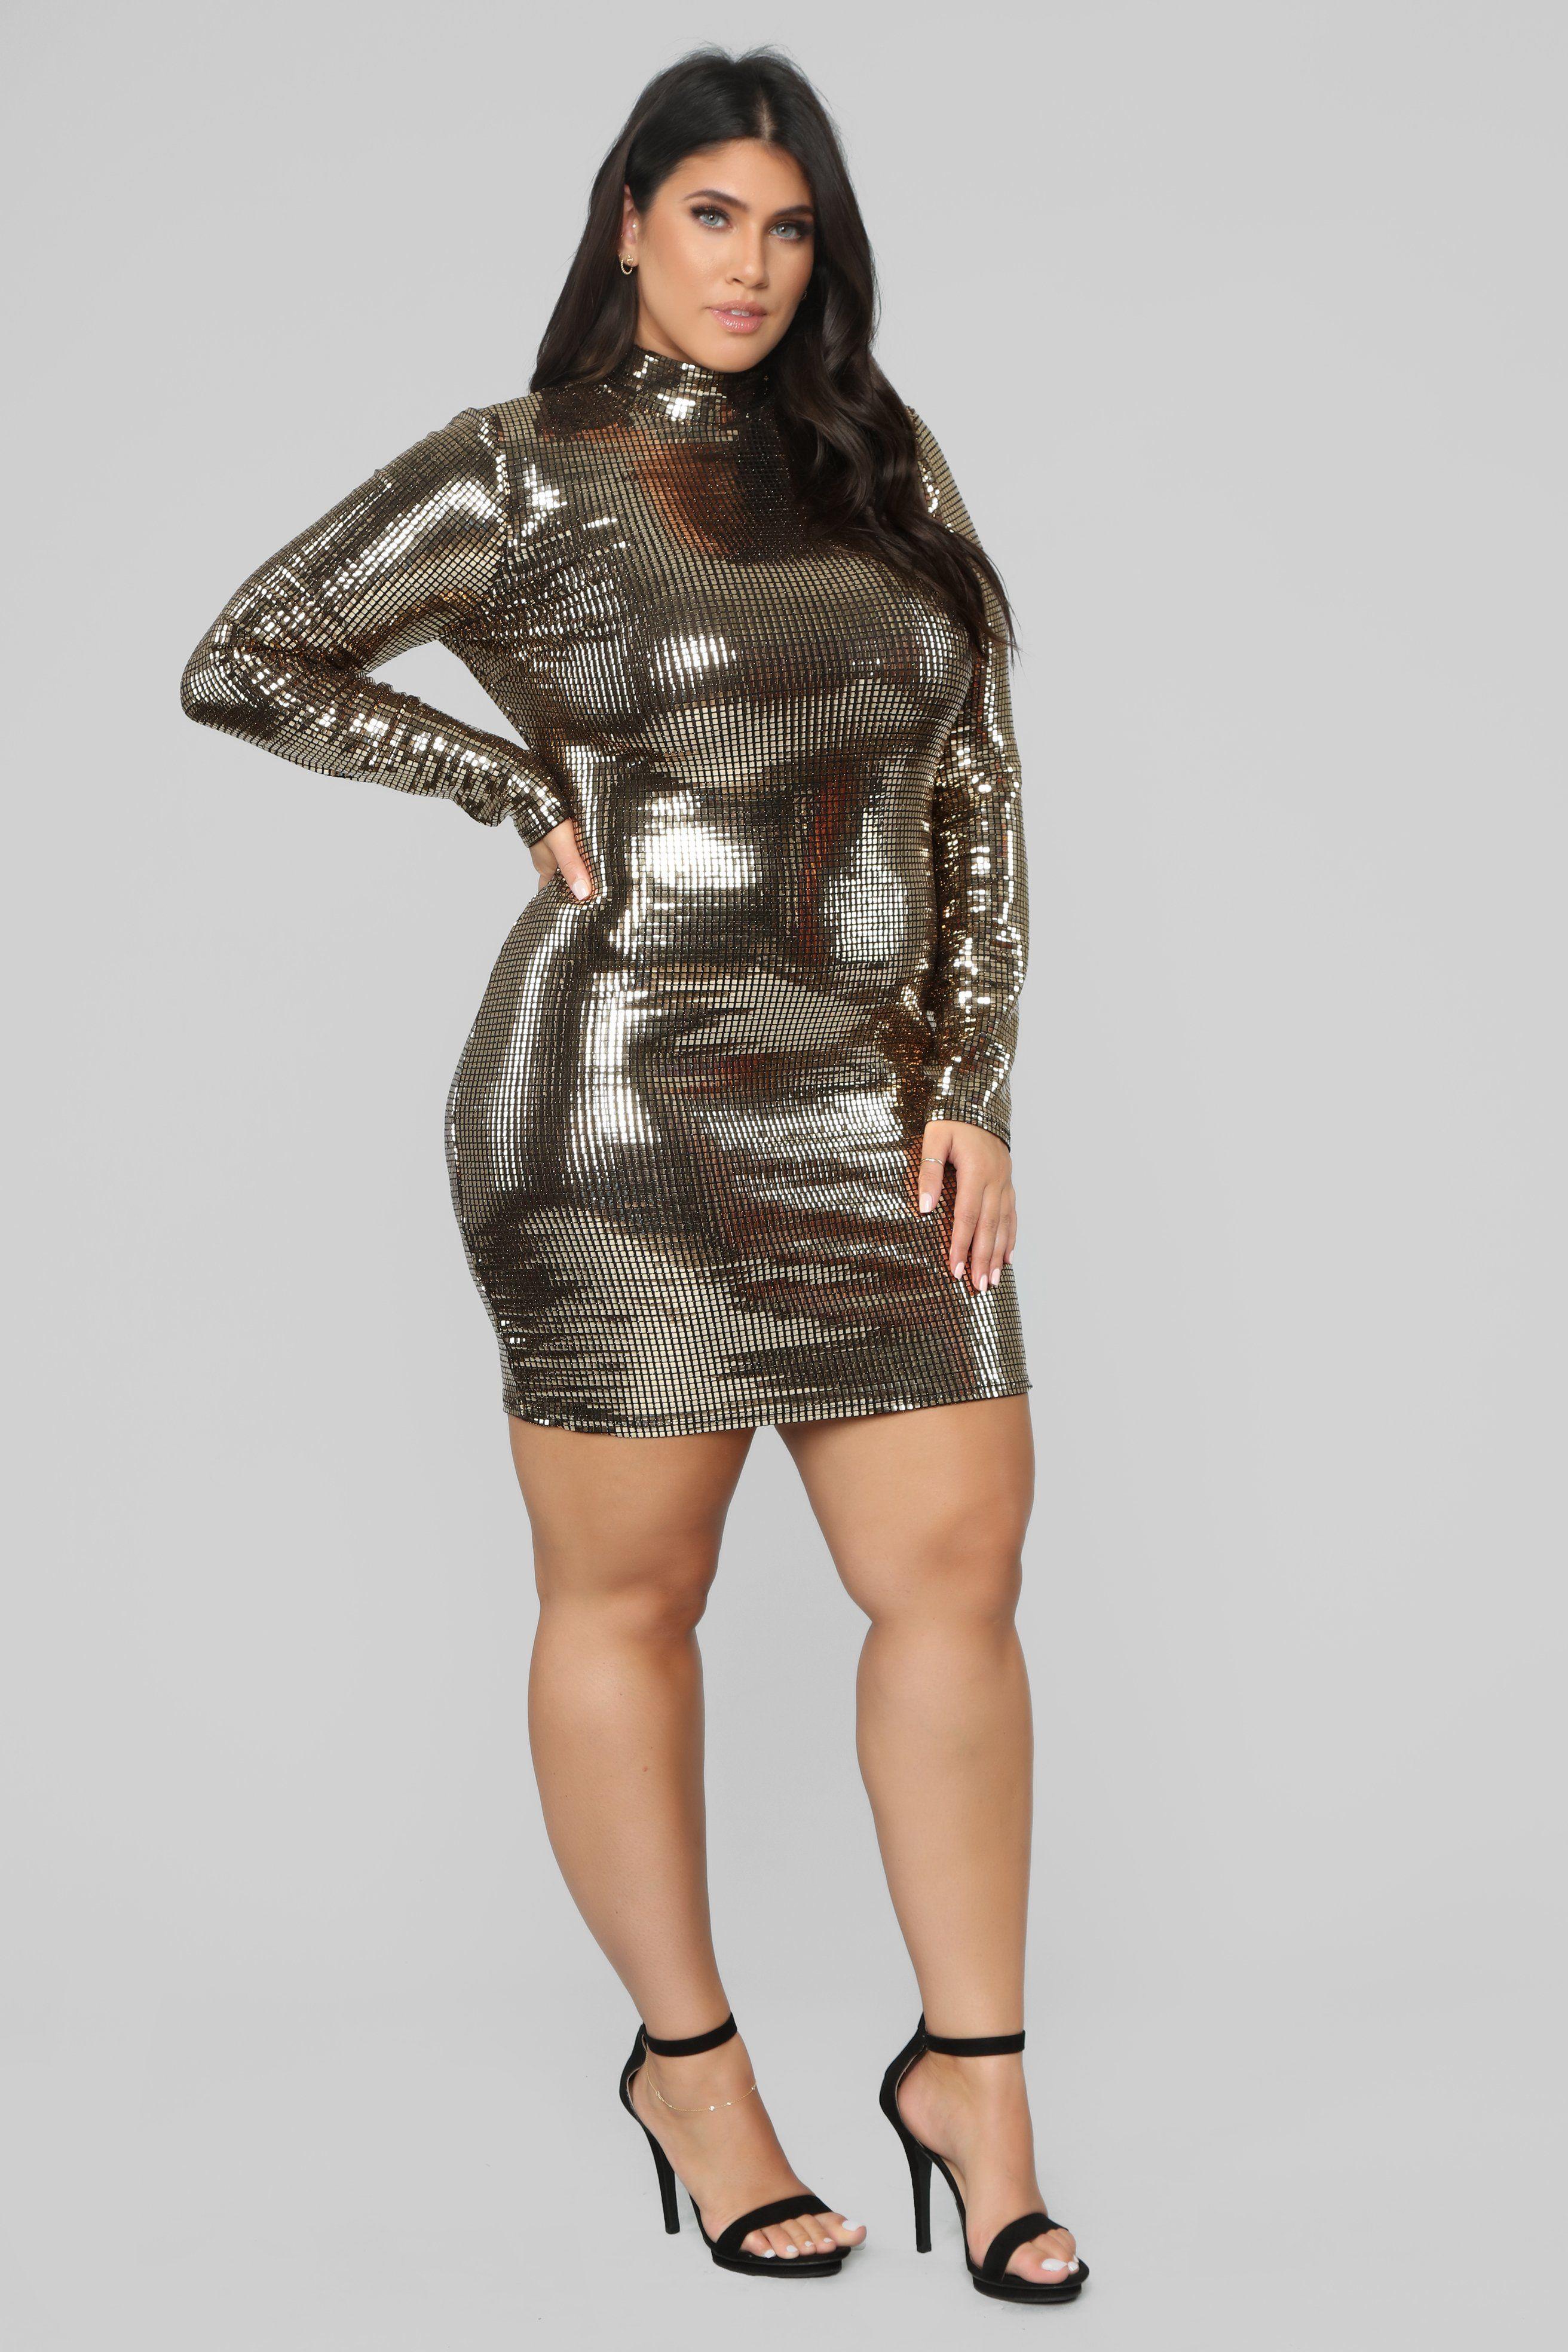 The Glow Up Metallic Dress Gold Metallic dress, Gold